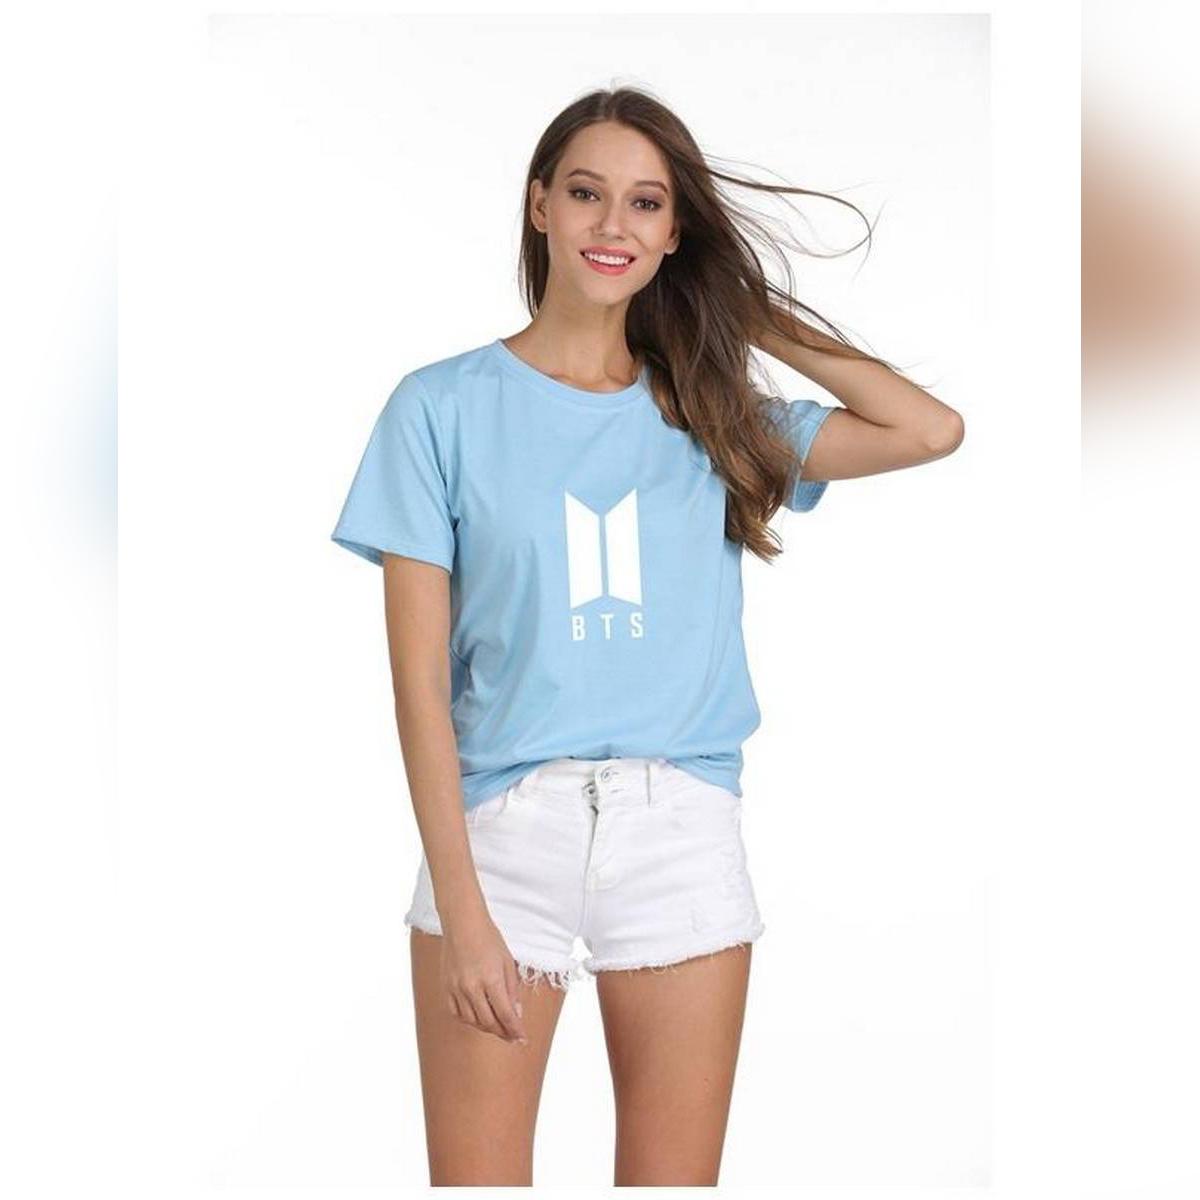 BTS Sky Blue Cotton Tshirt For Women 2020102